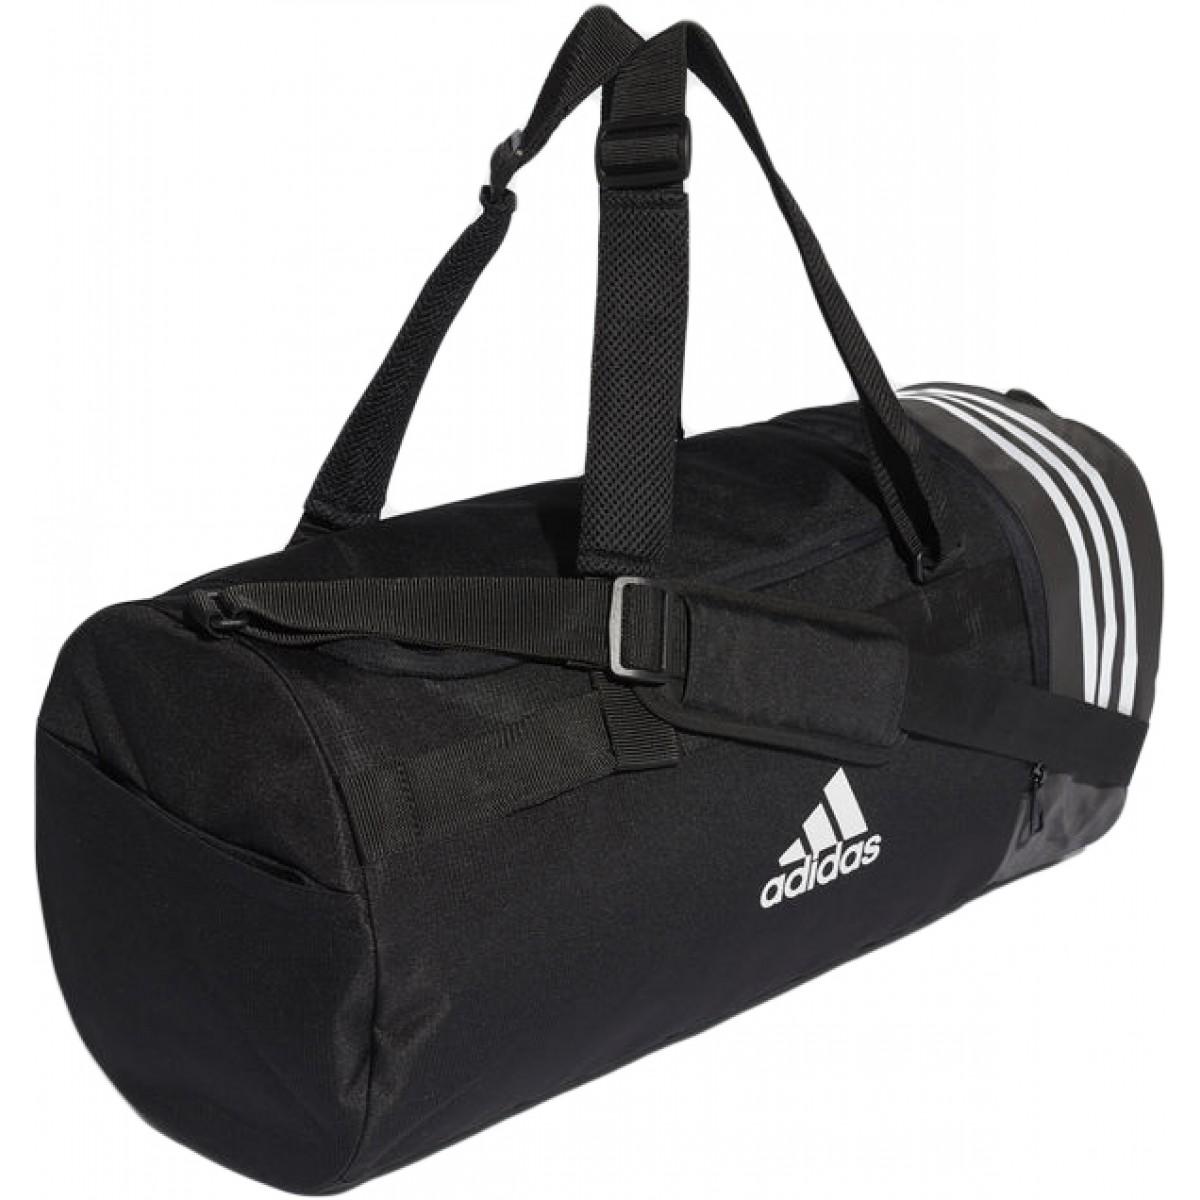 De Athlete Deporte Adidas Bolsa BolsasTennispro pqUVSzM